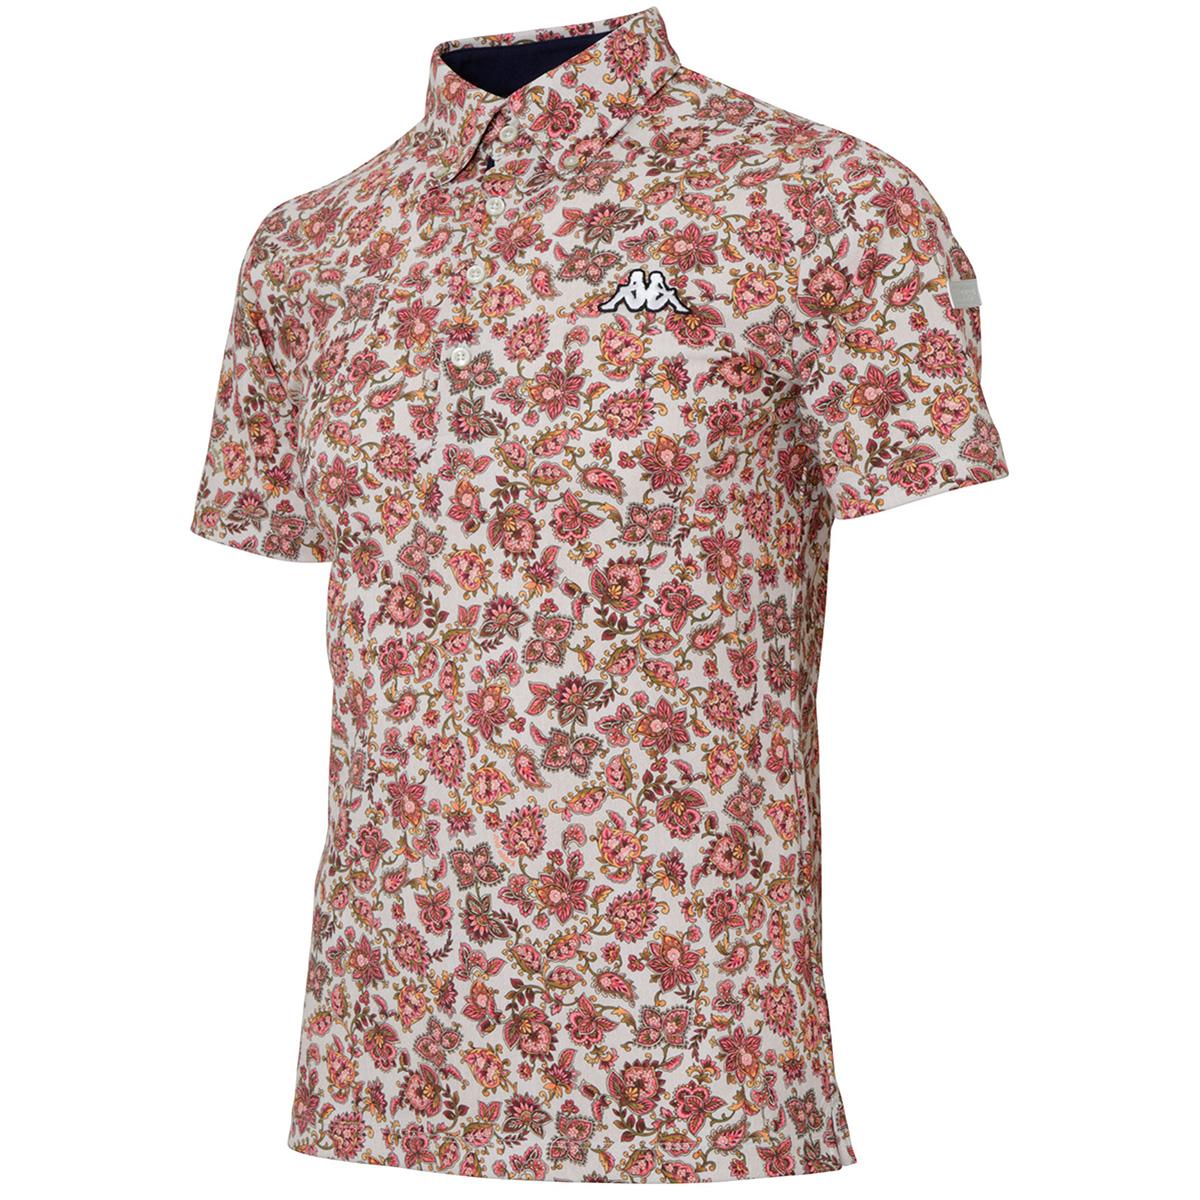 Collezione Italia フローラル総柄プリント ストレッチ半袖ポロシャツ